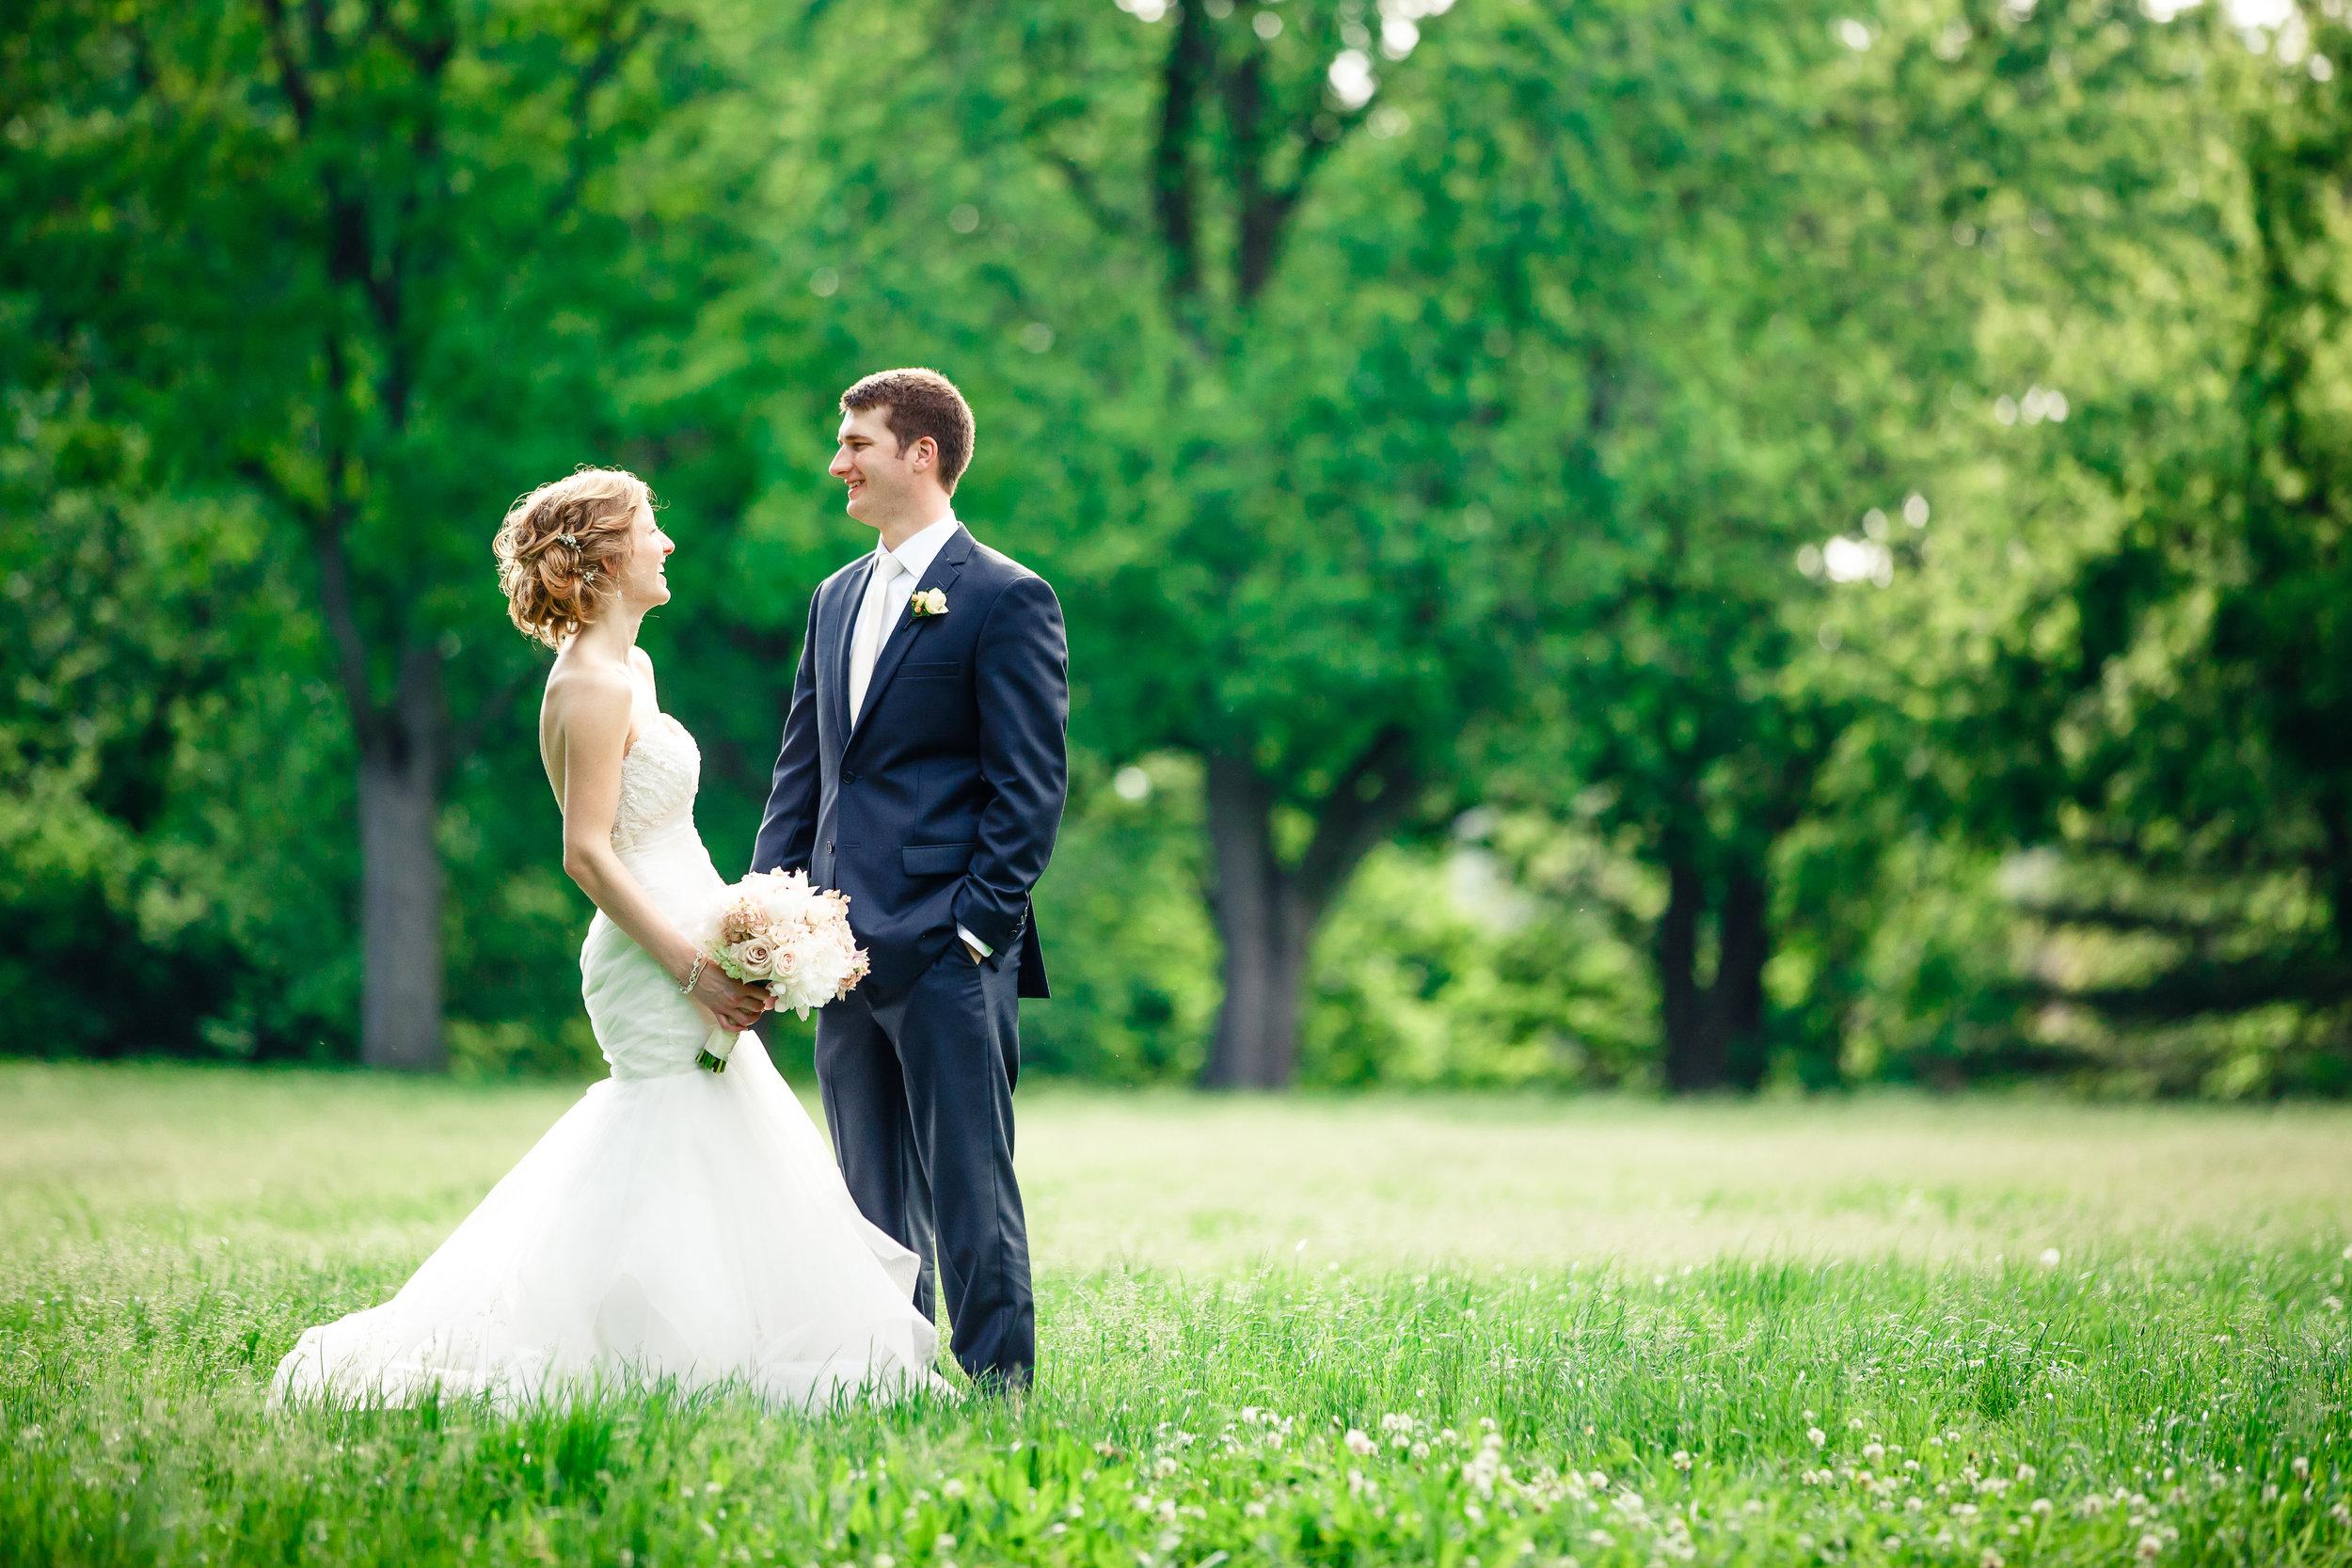 Lafayette Square Park St. Louis Wedding Photographer Oldani Photography 4.jpg